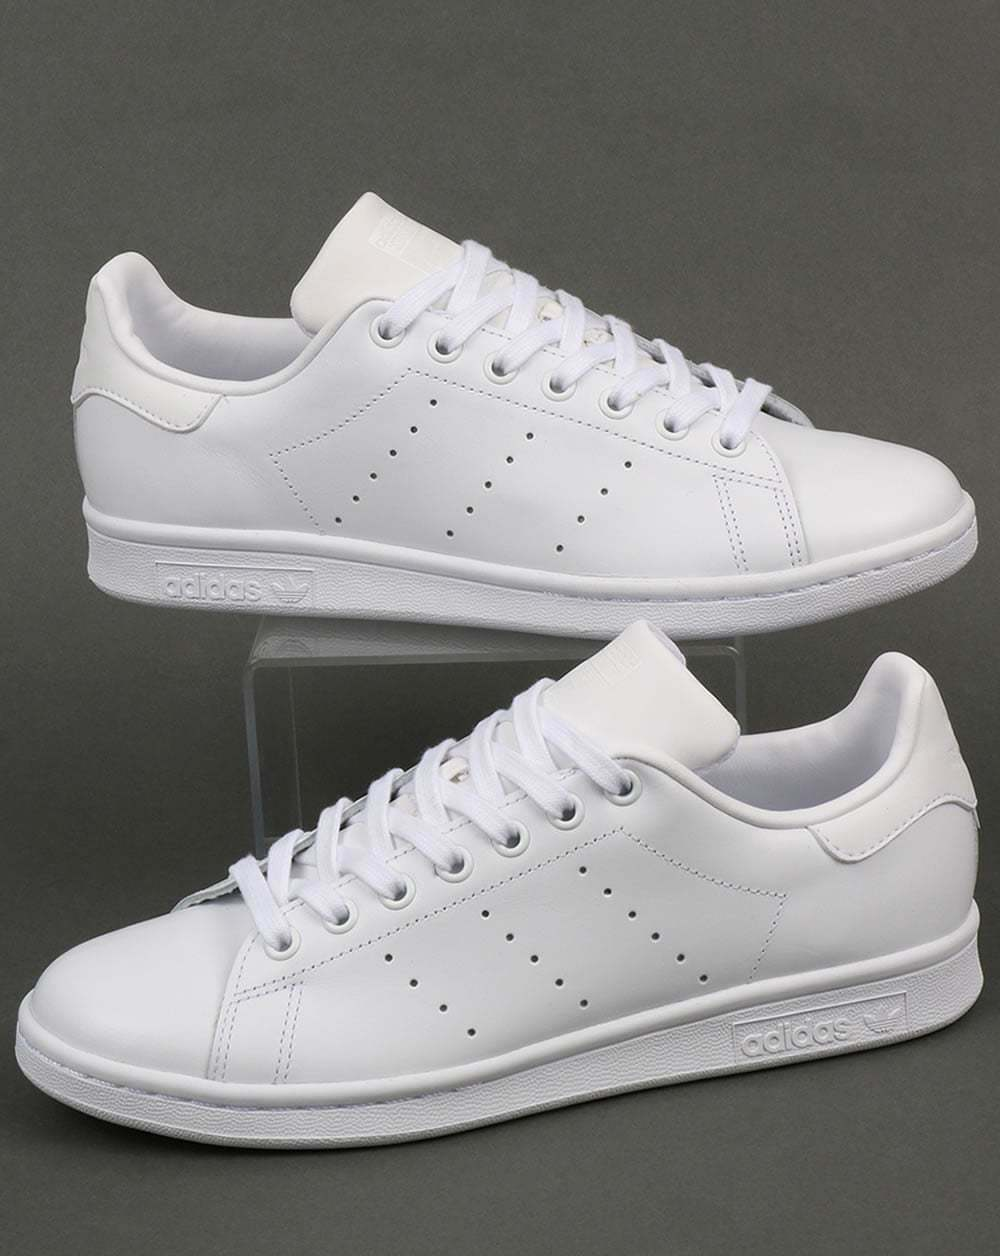 ADIDAS Originals-Adidas Stan Smith Bianca Scarpe Da Ginnastica in Pelle Bianca Smith Triplo-Classic d28ef8